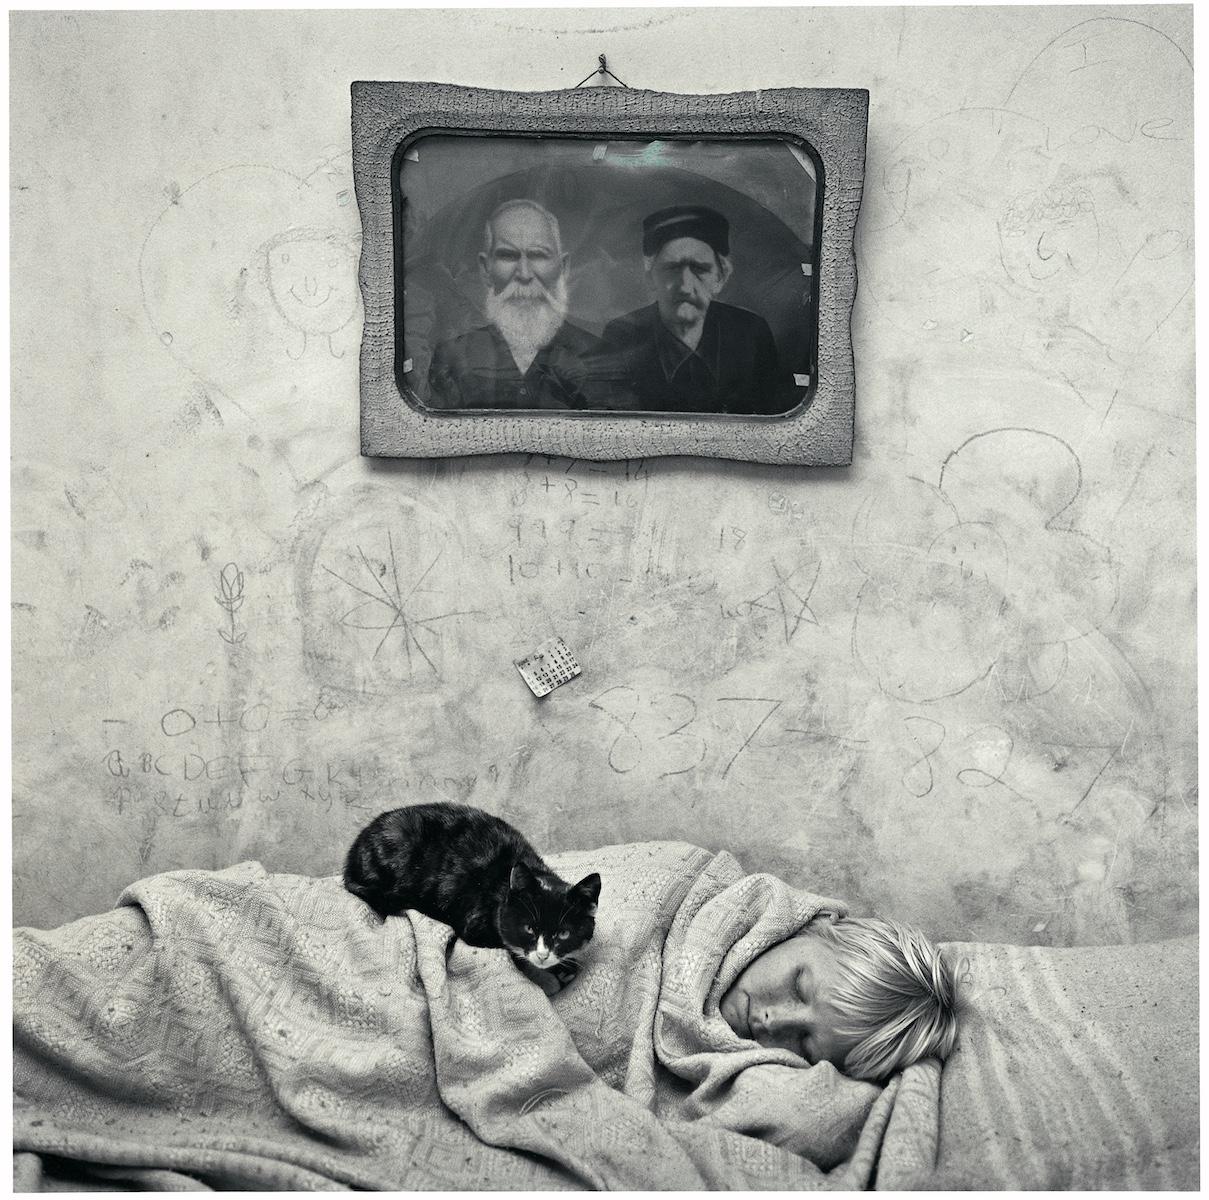 ROGER BALLEN Portrait of Sleeping Girl, 2000 © Roger Ballen